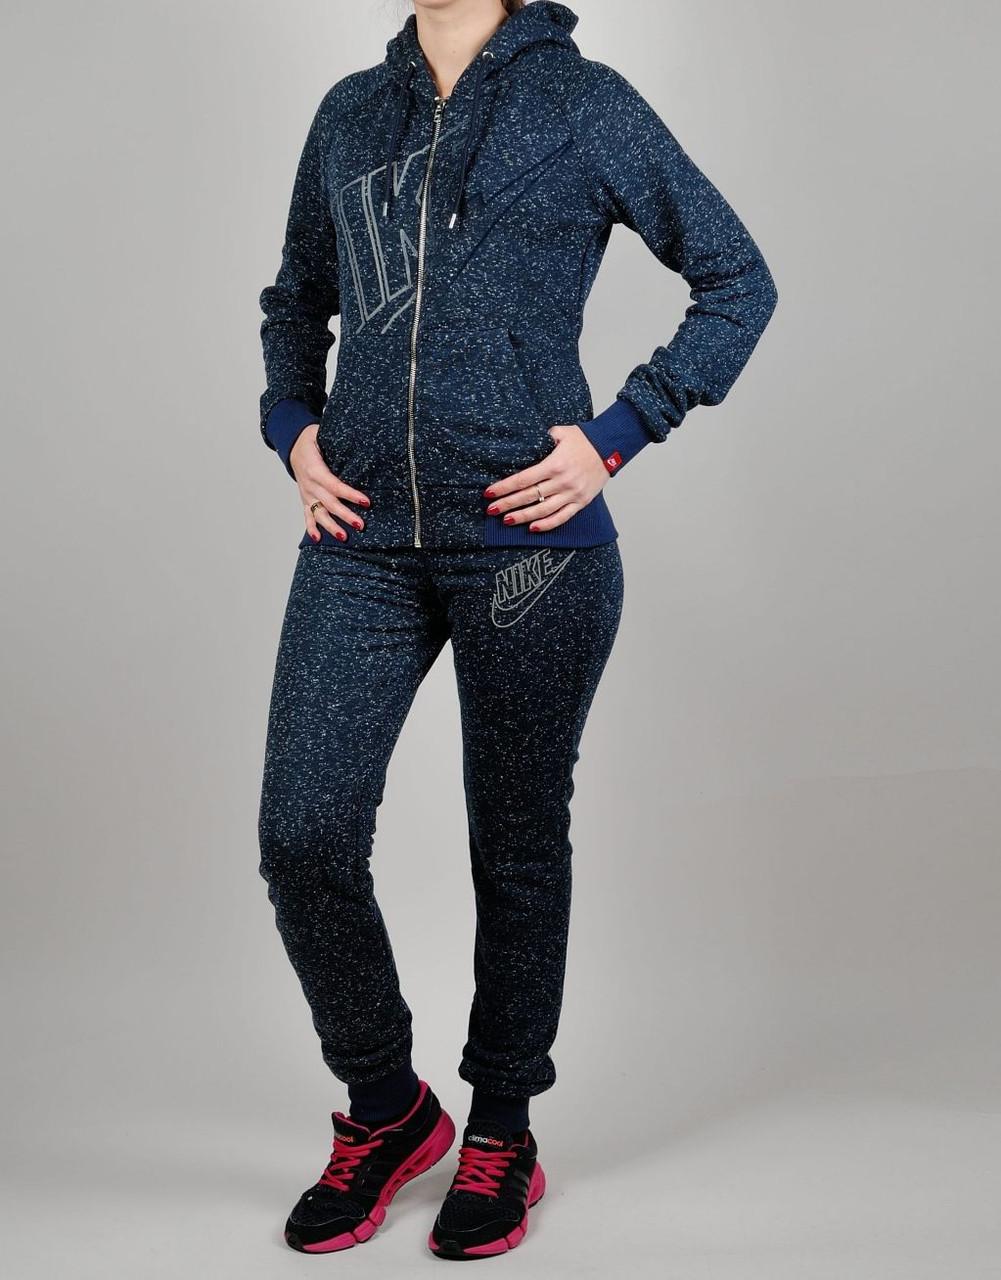 72ff37ea Женский спортивный костюм Nike 7184 Тёмно-синий - Брендовая одежда от  интернет-магазина «